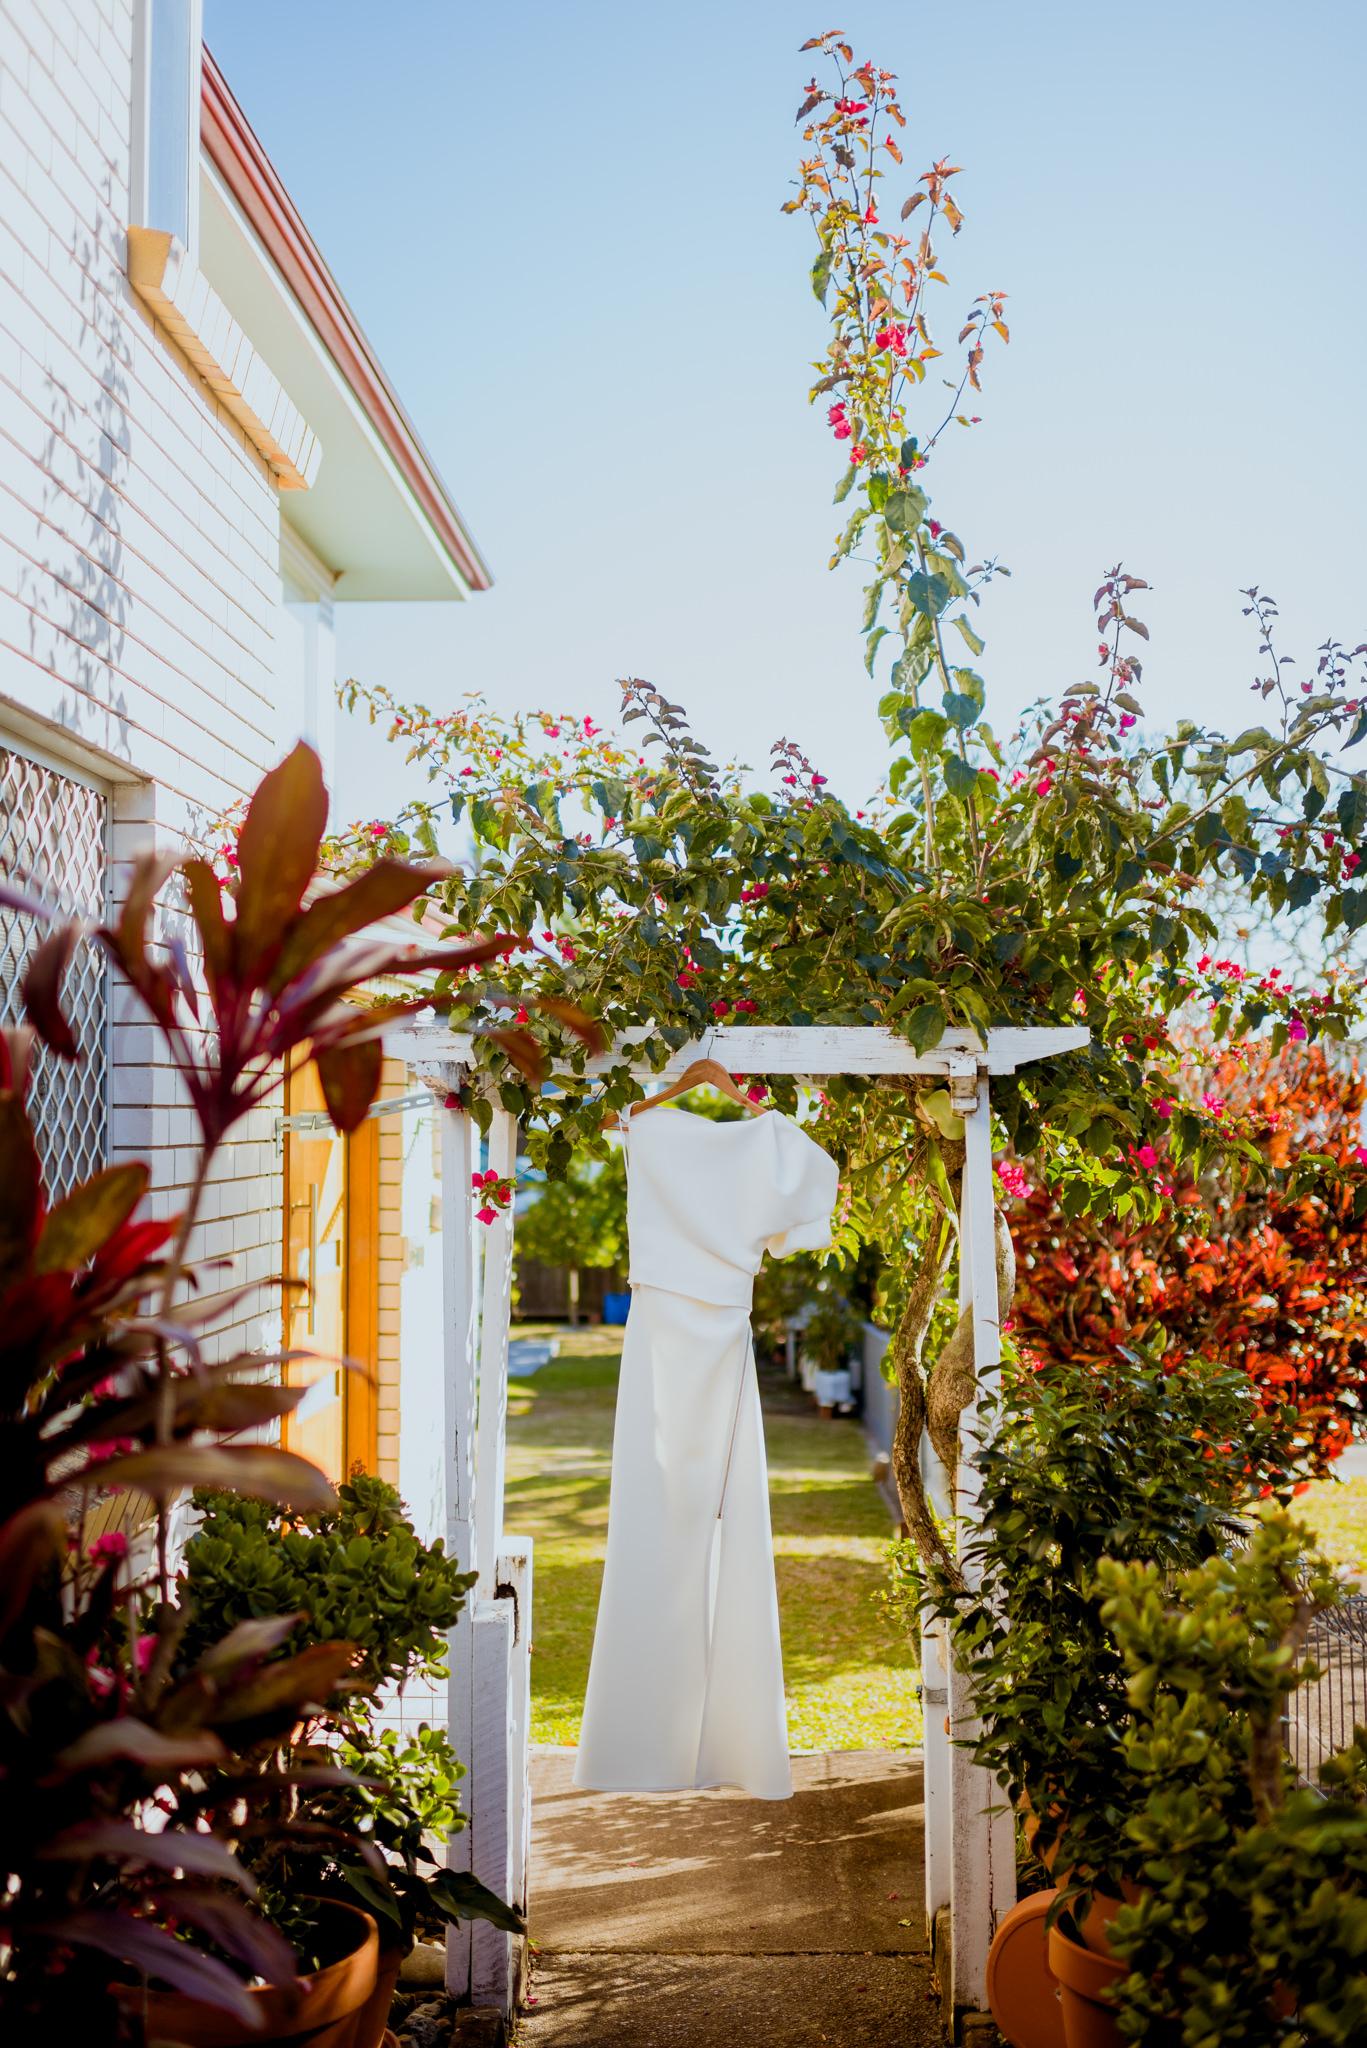 A modern white wedding dress hanging from a garden arbour in a backyard